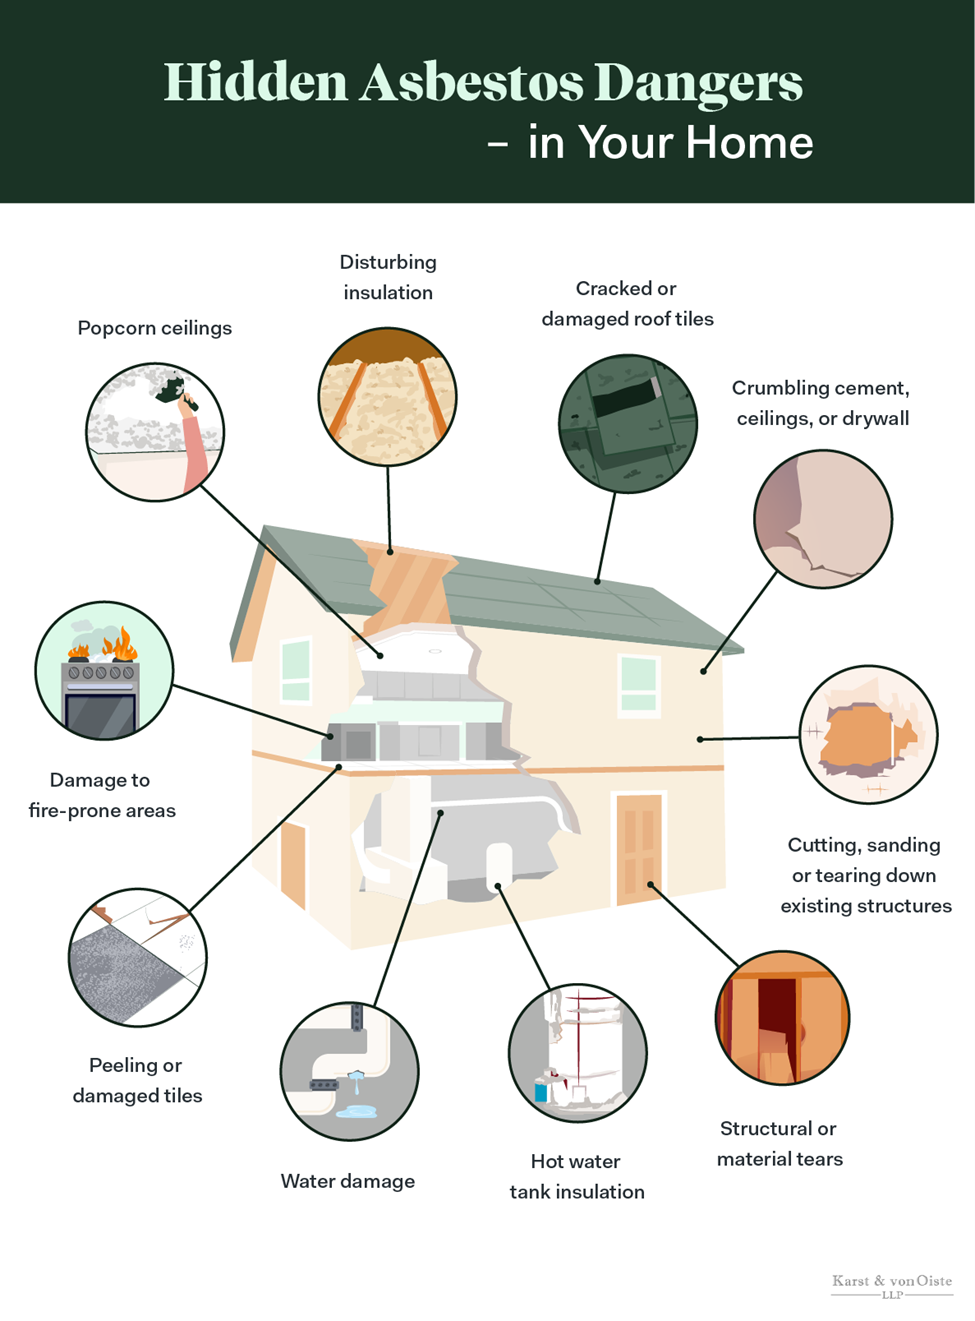 Asbestos Dangers and Risks